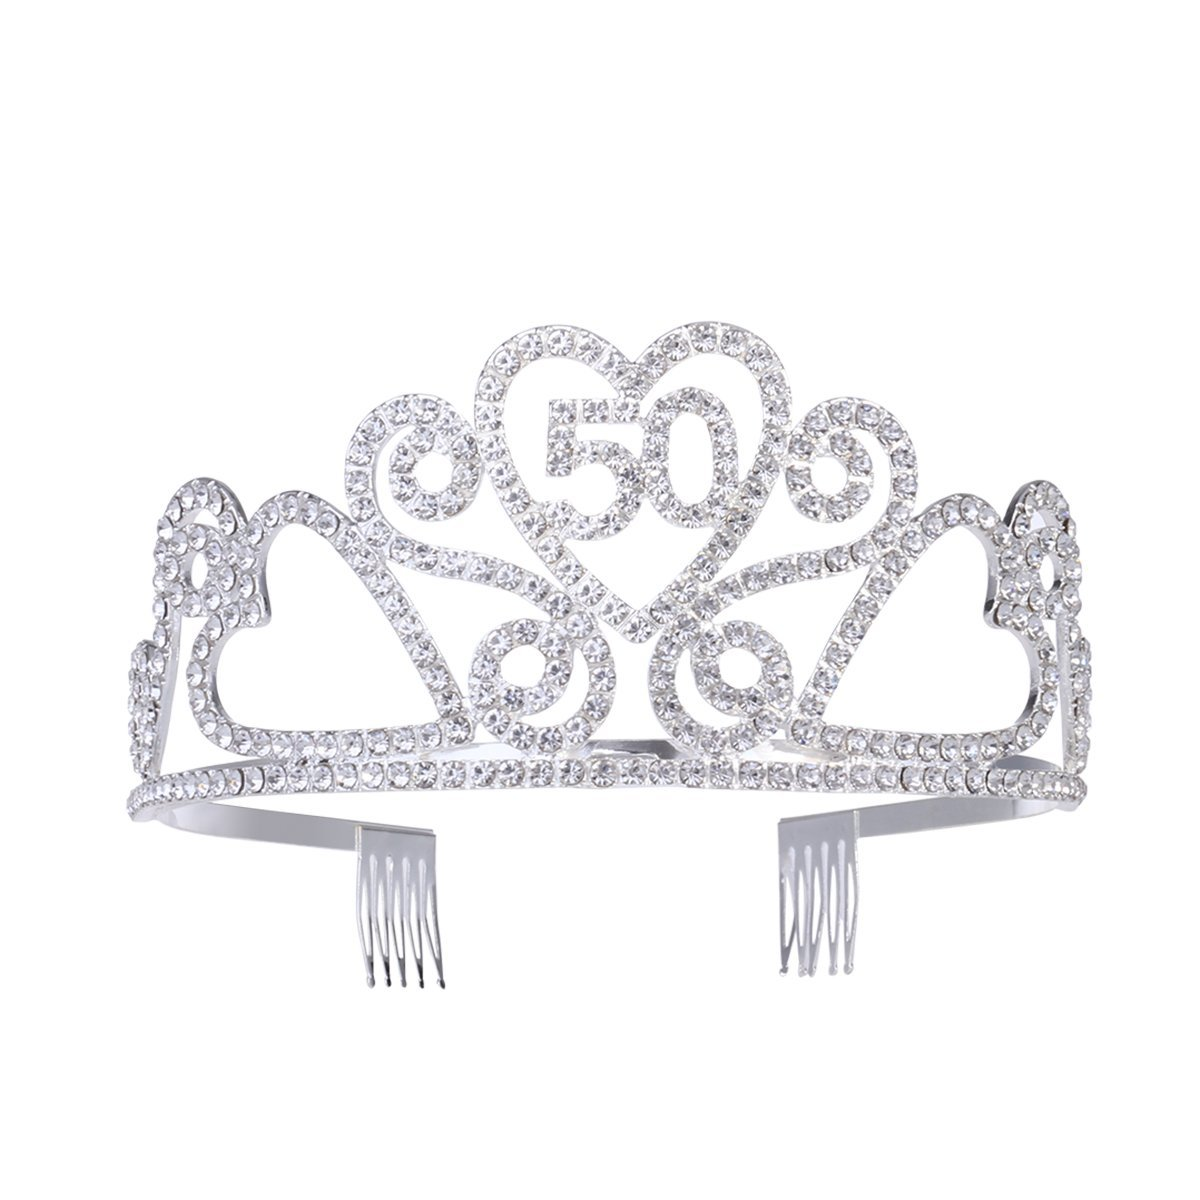 b7c0e5992e Buy Frcolor Women 50th Birthday Tiara Crystal Rhinestone Birthday ...